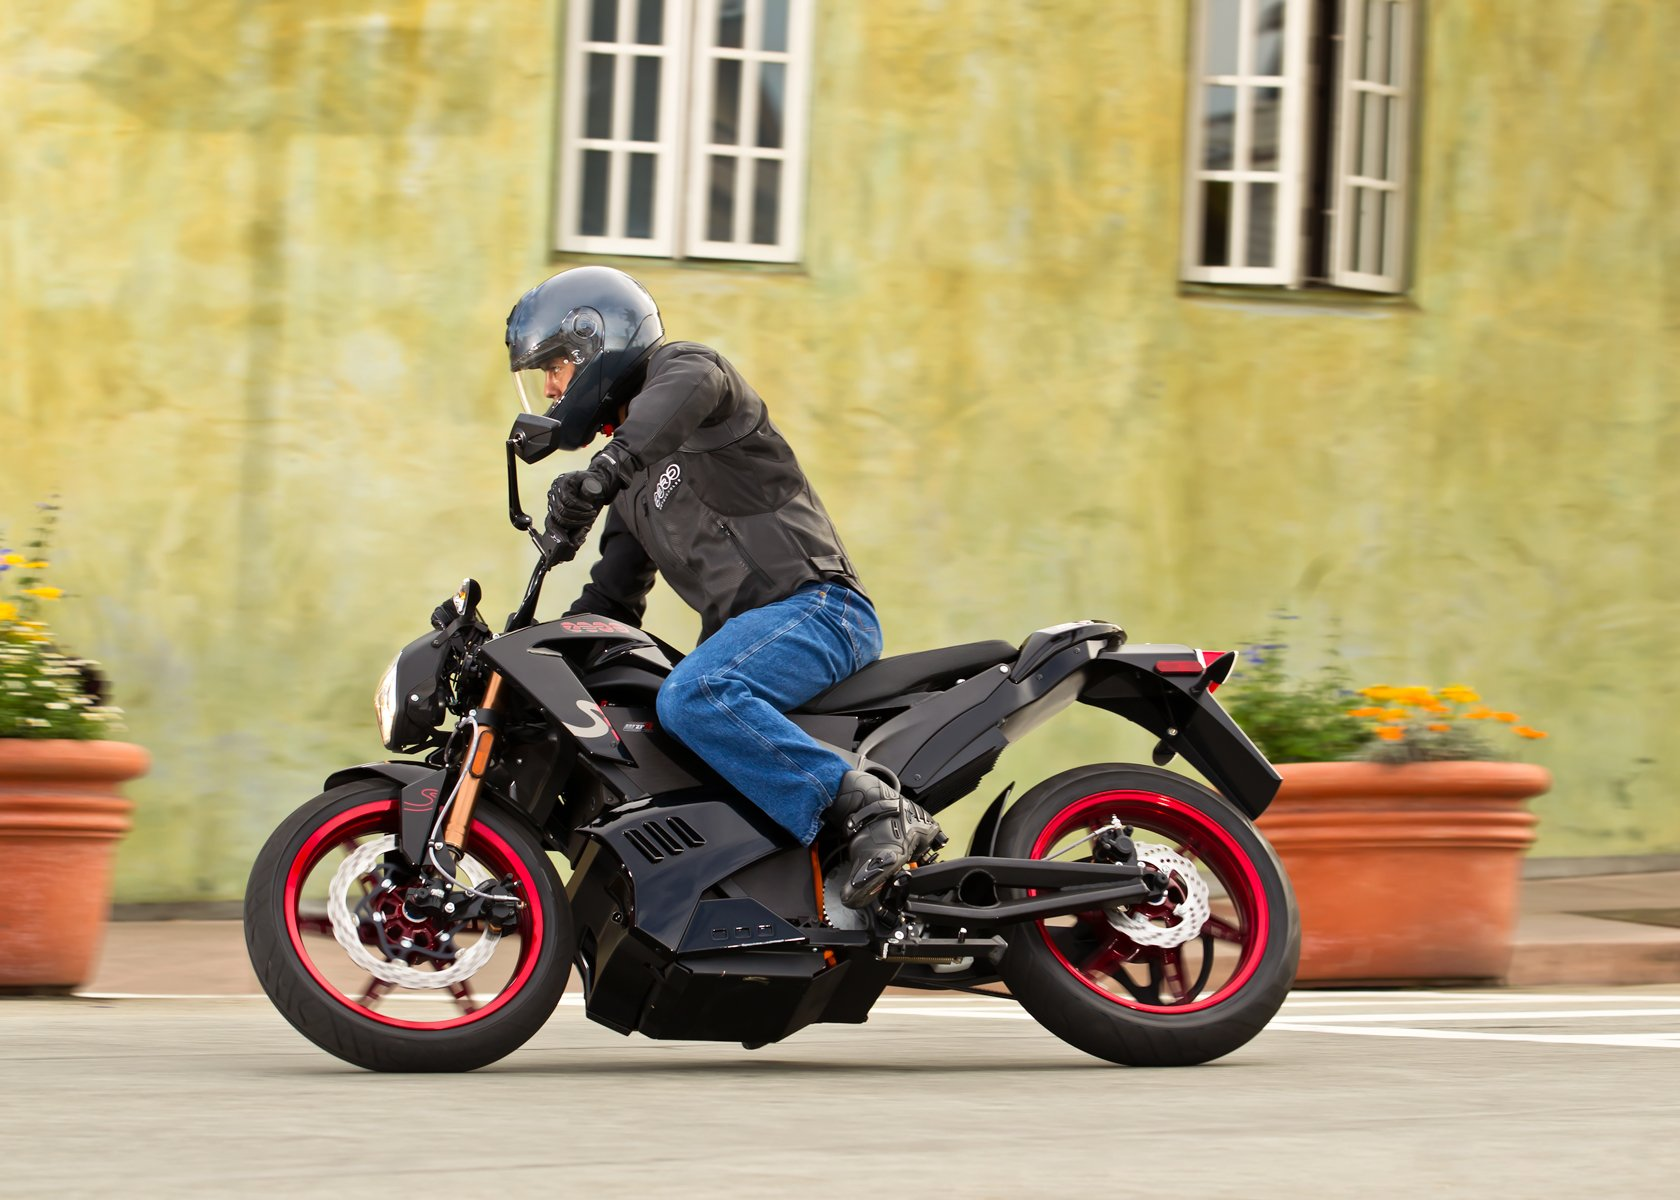 production electric motorcycle breaks 100 mile range the. Black Bedroom Furniture Sets. Home Design Ideas